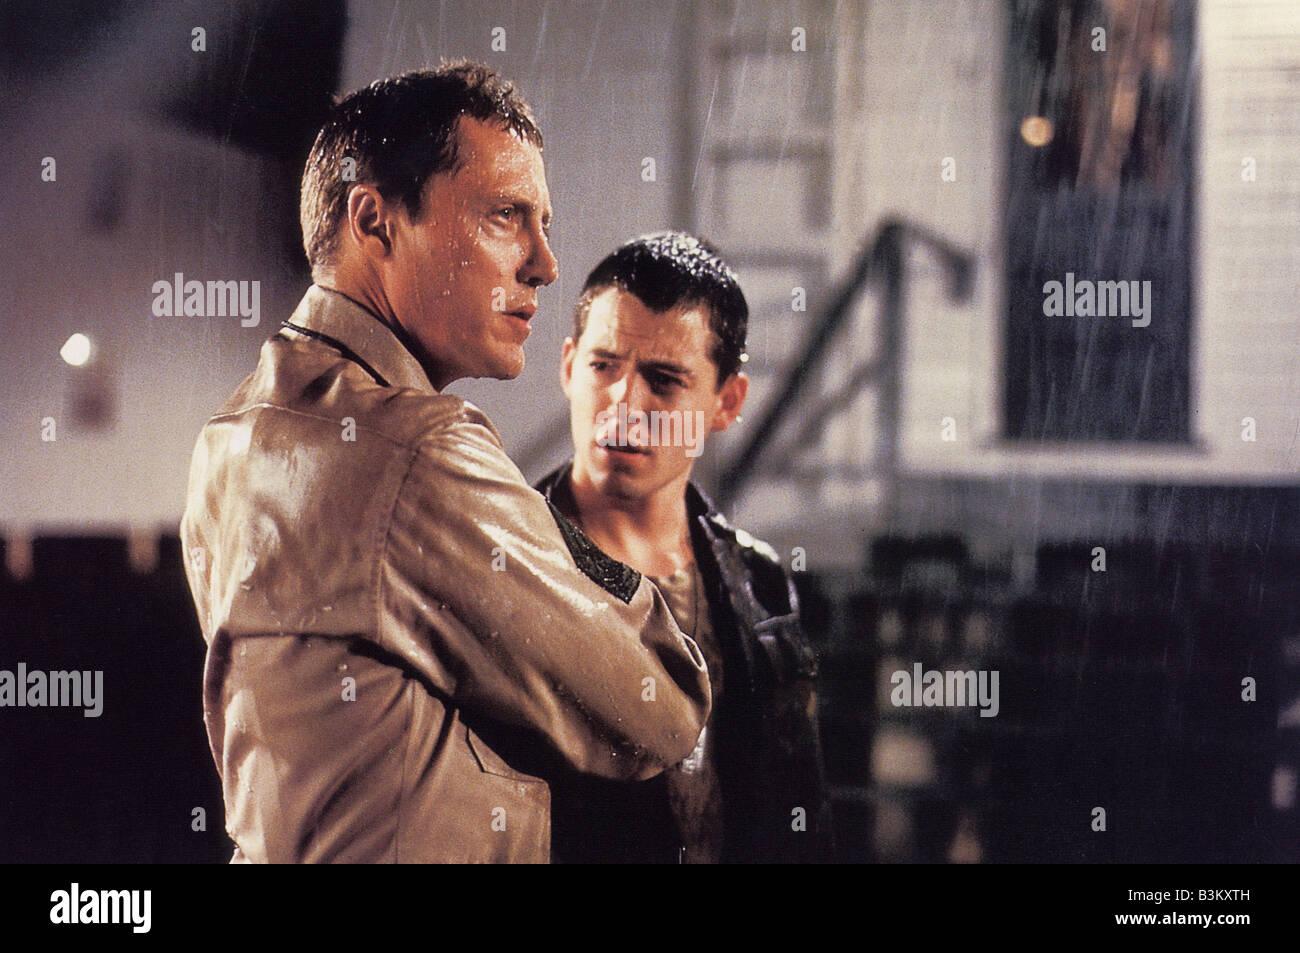 Biloxi Blues 1988 Universal Film With Christopher Walken At Left